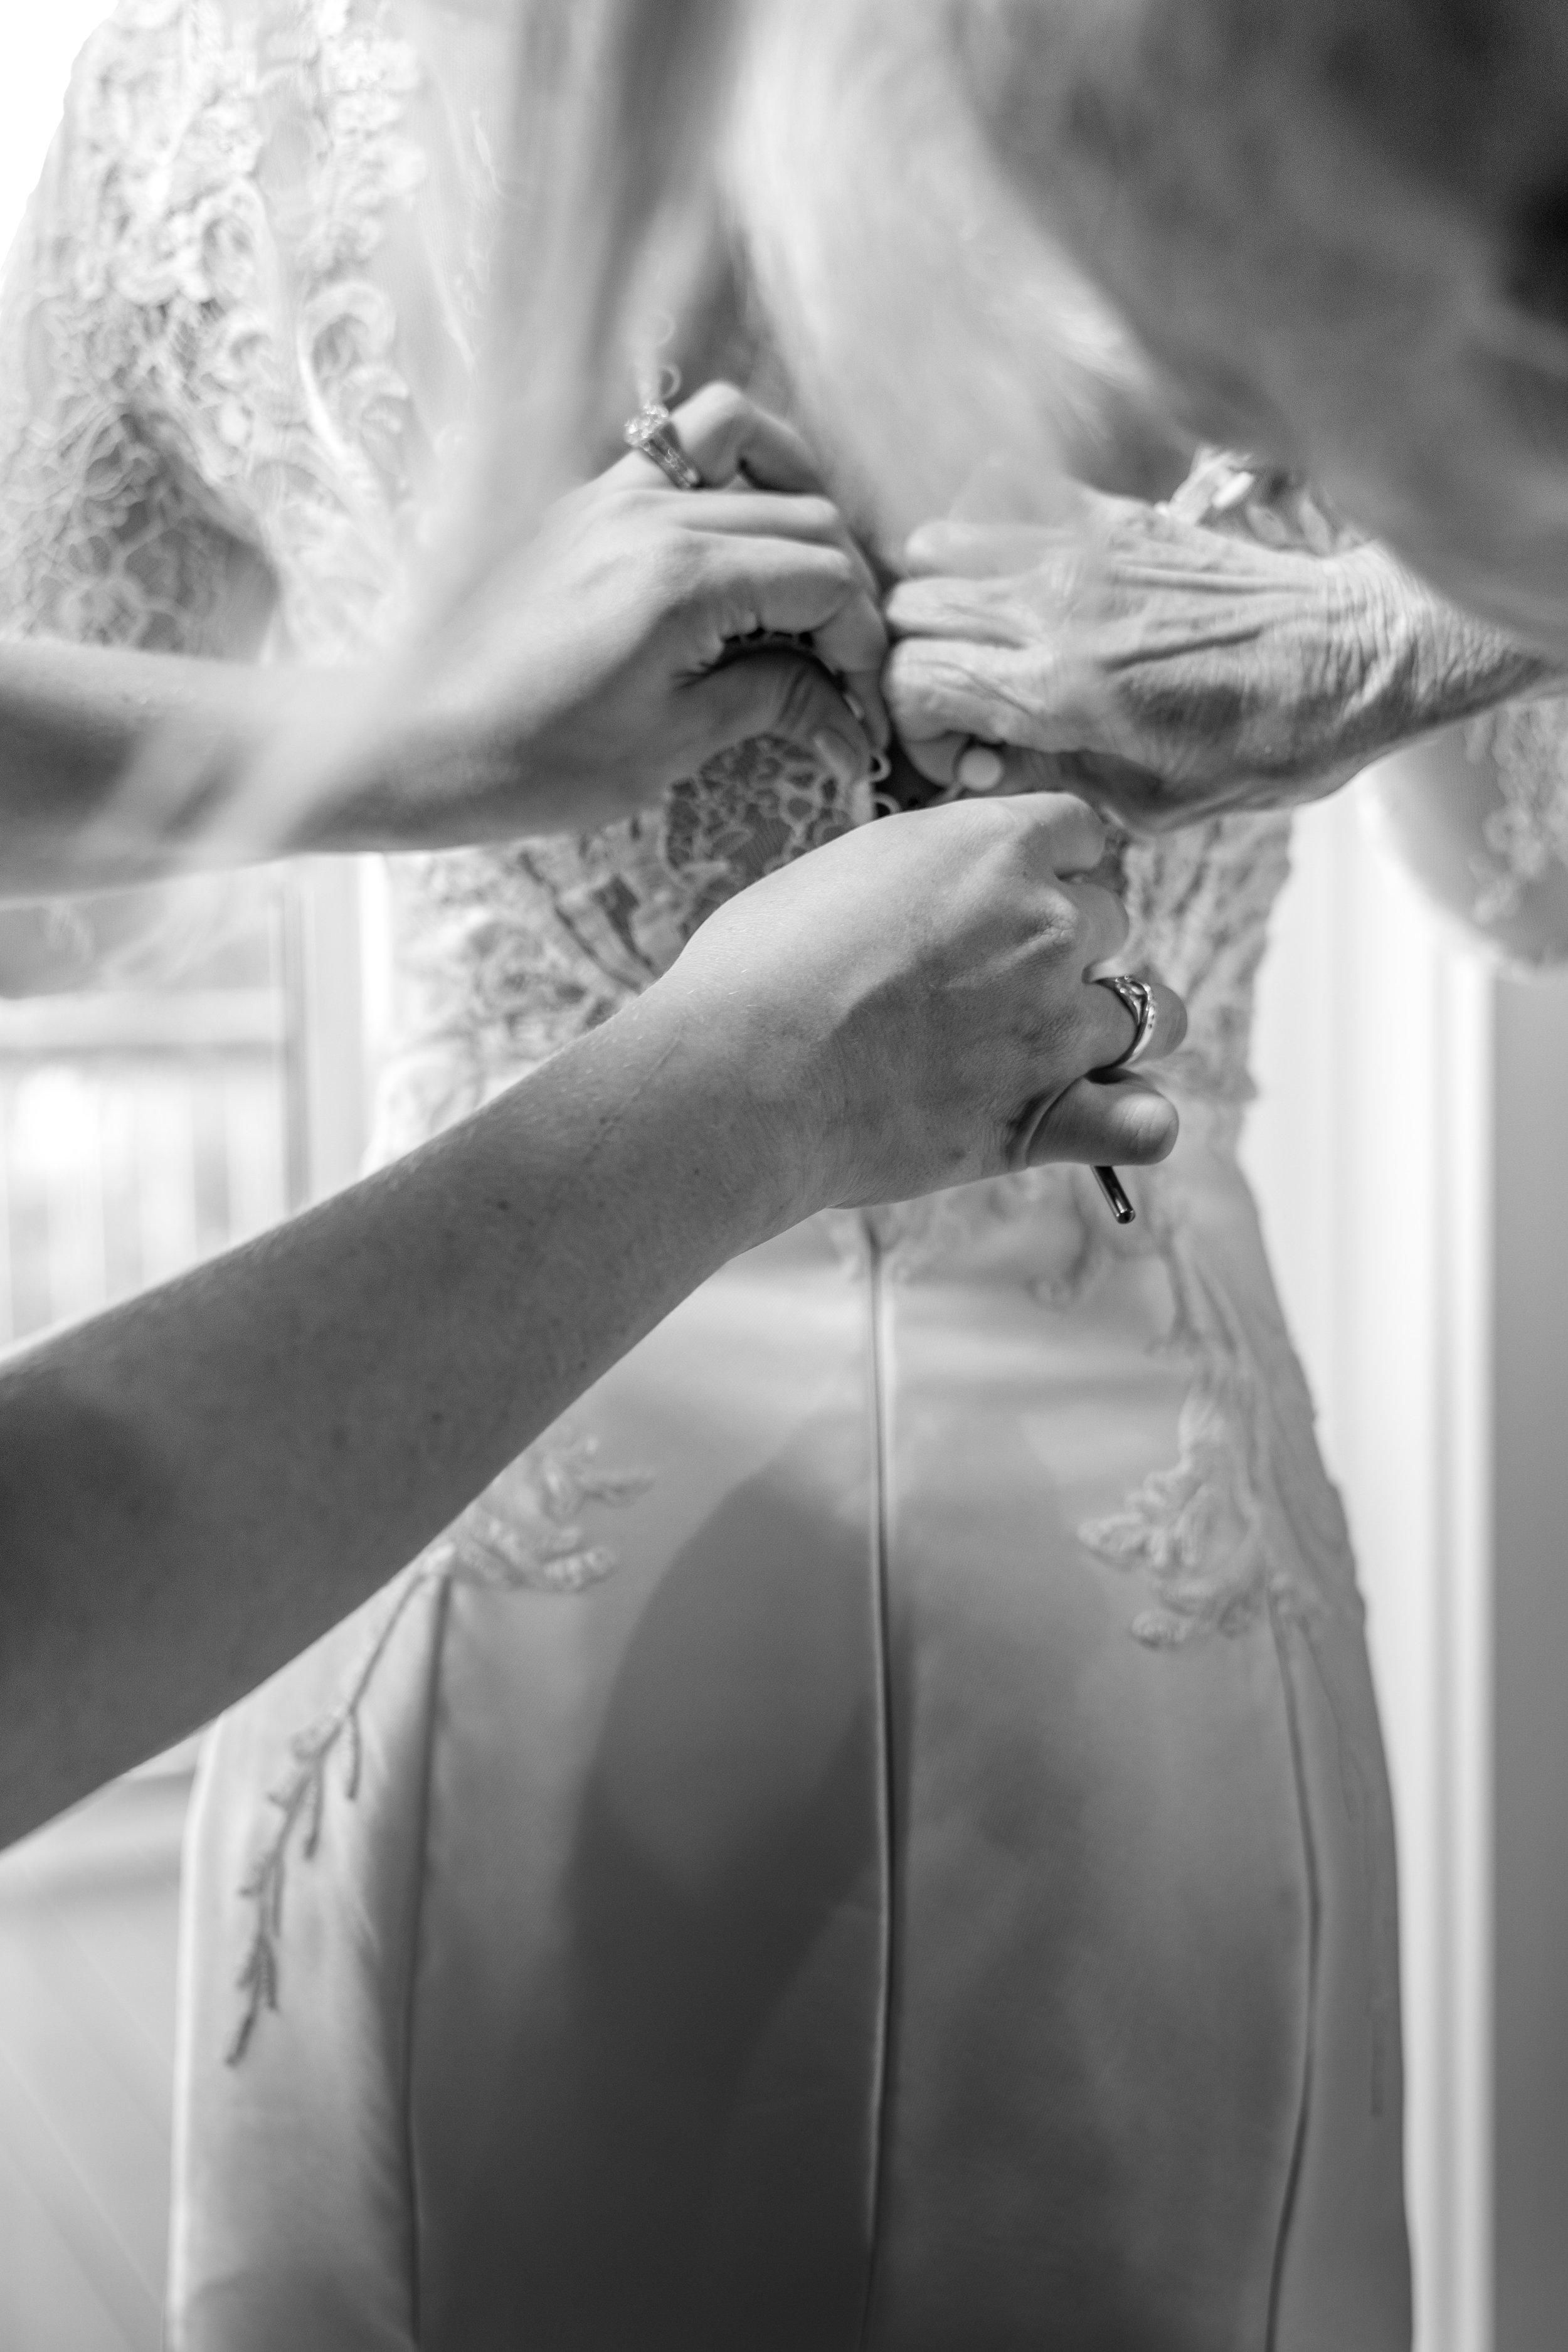 candid-black-white-wedding-photography.jpg